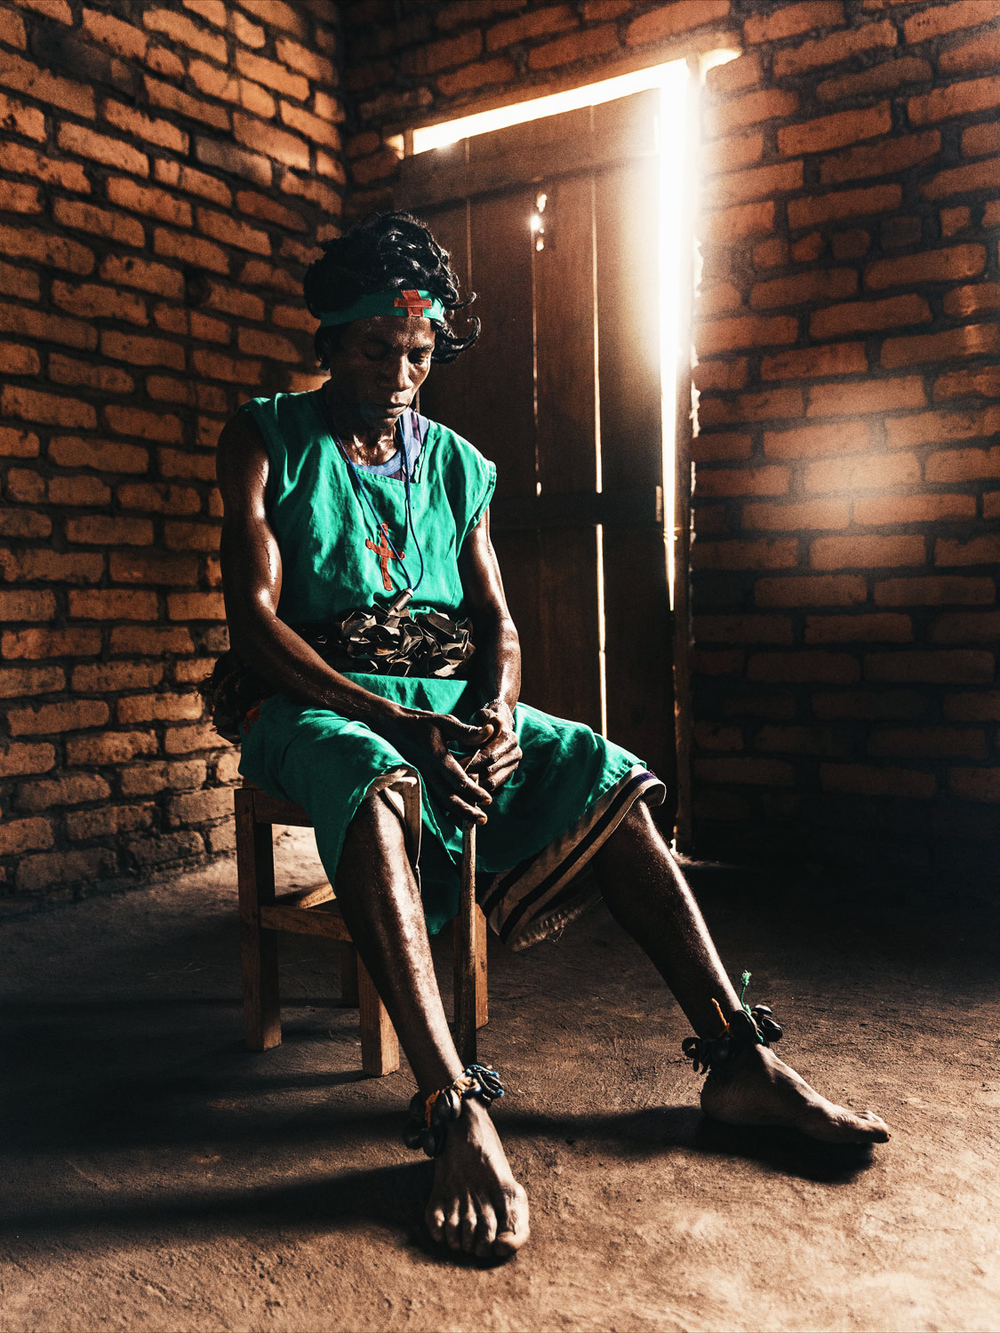 CallieGiovanna_Africa_Malawi_Chitimba_20150101_06185.jpg